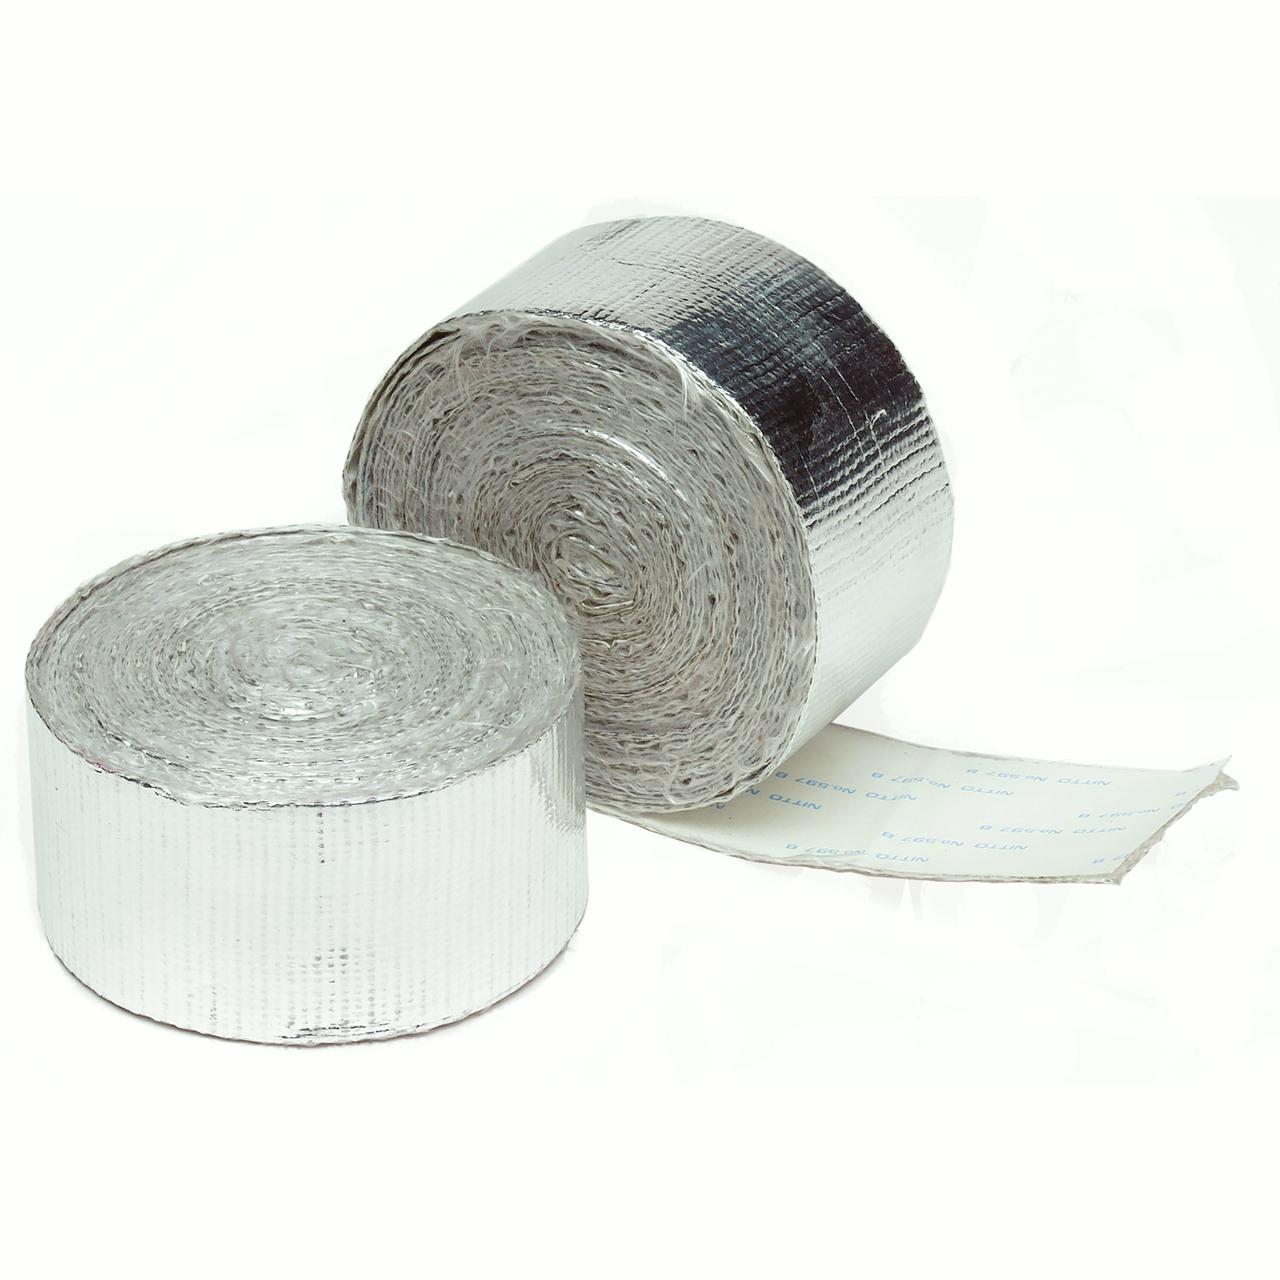 Heatshield Products 340410 Thermaflect 4-Inch Wide X 10-Feet Heat Shield Tape